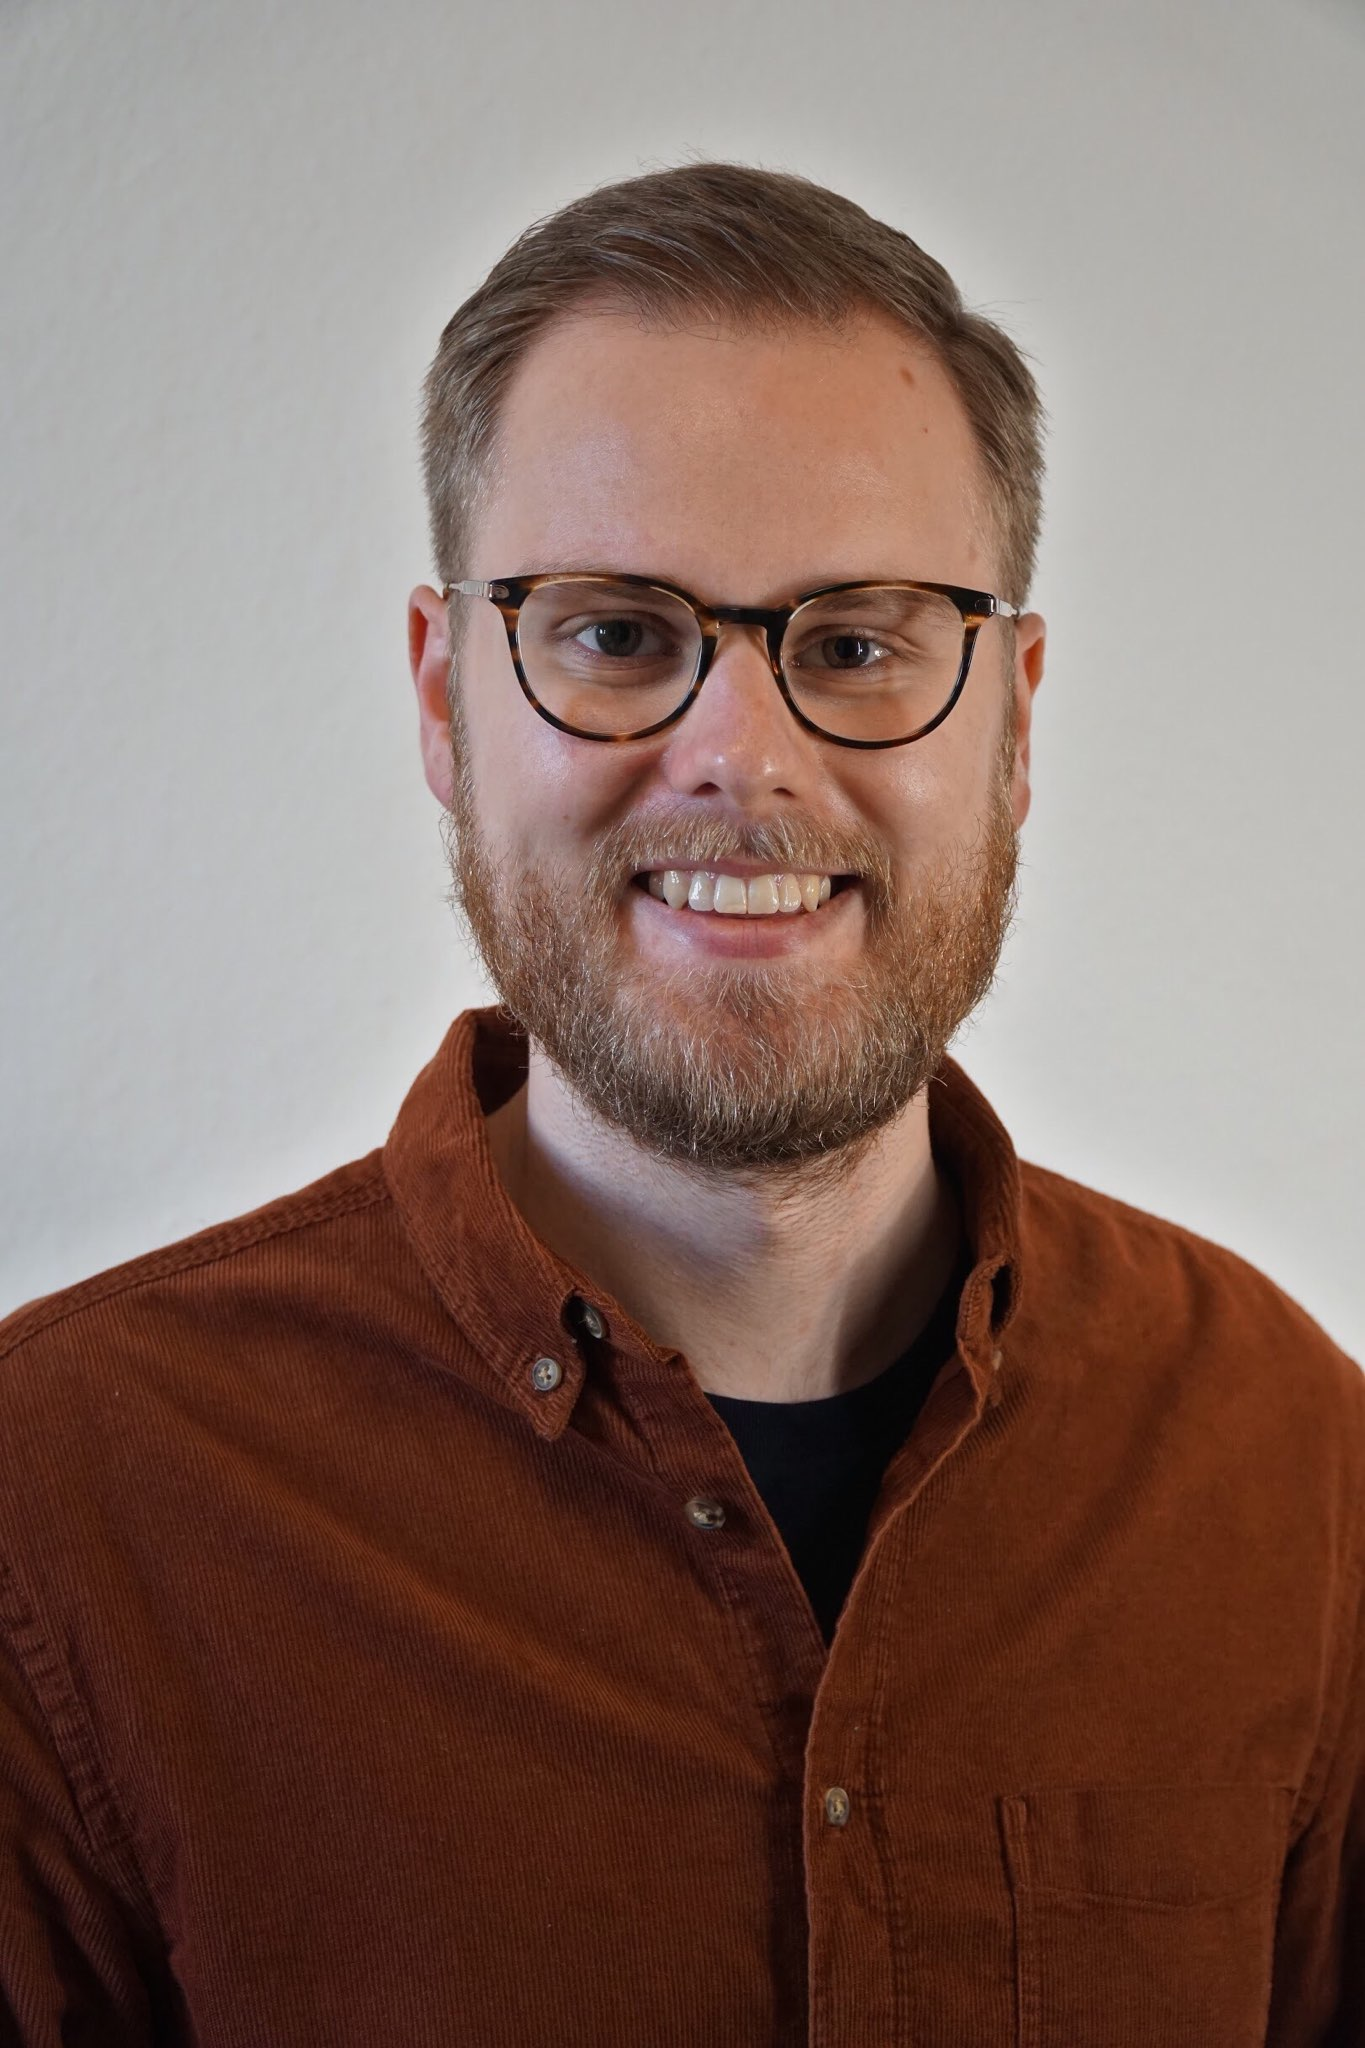 Moritz Bassen